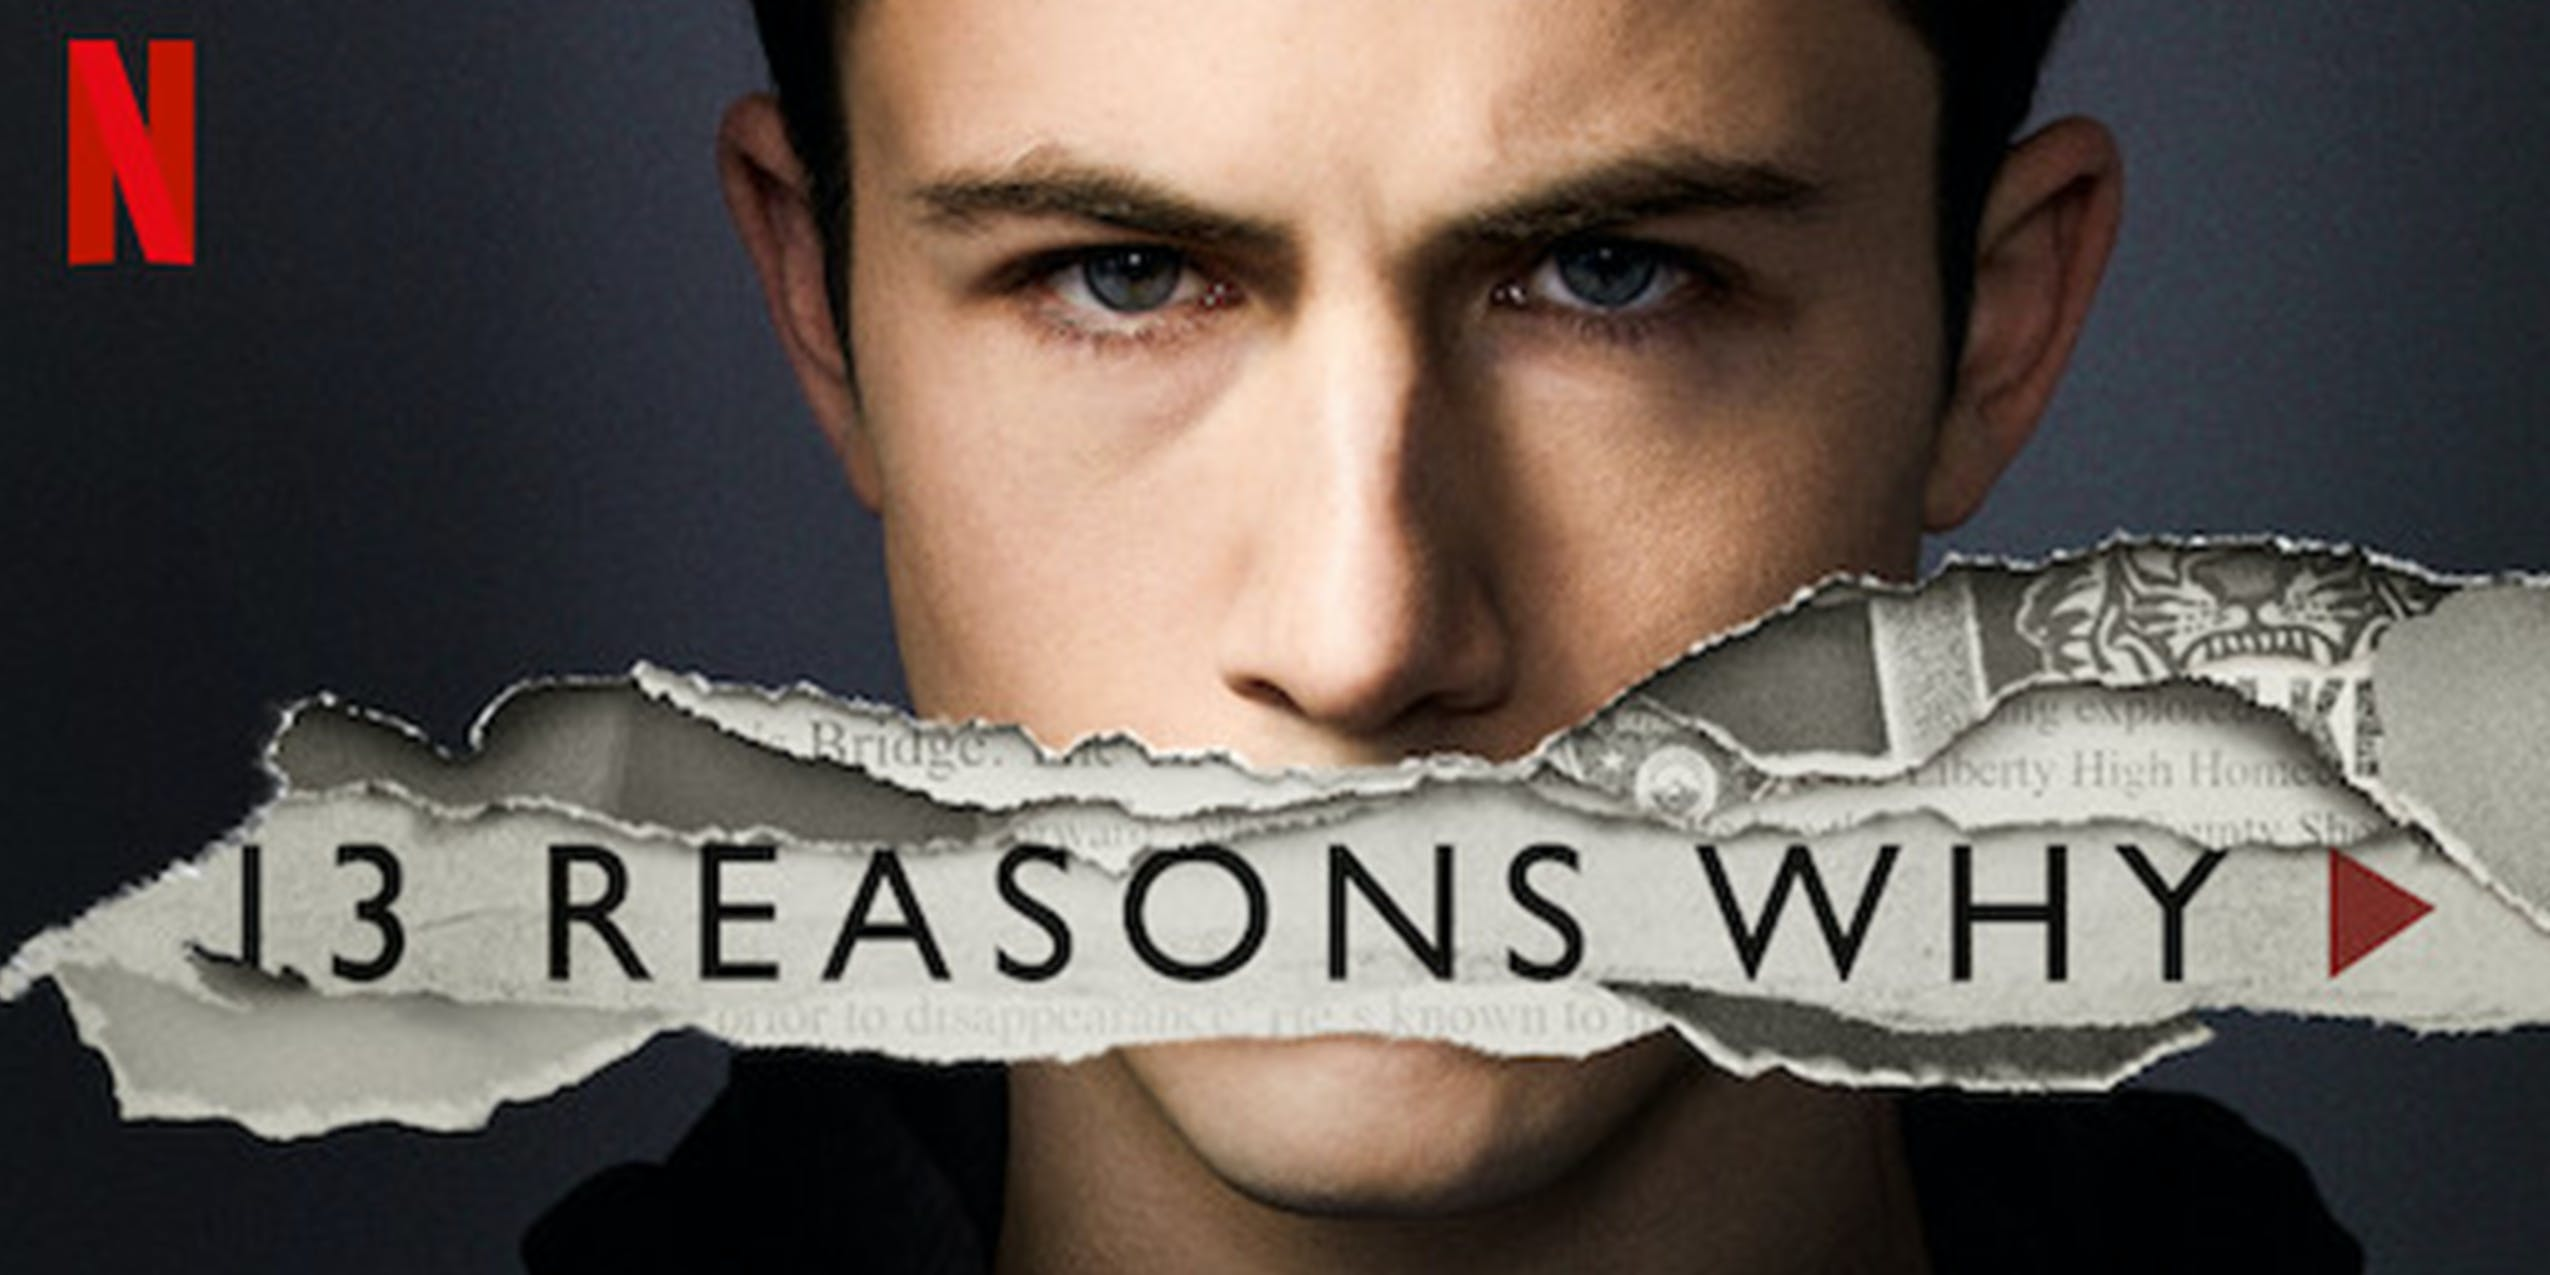 13 reasons why Netflix original series